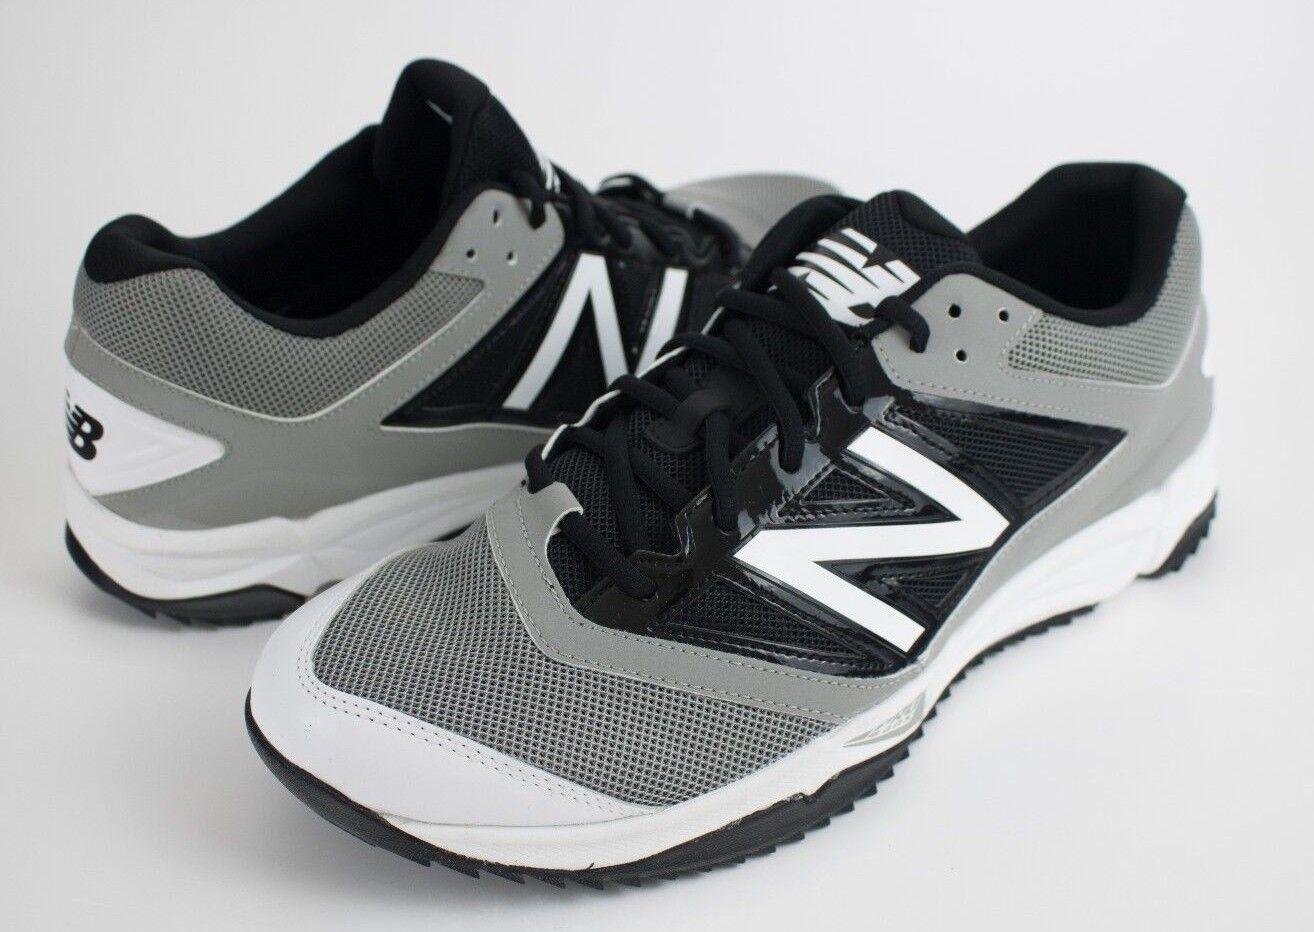 New Balance hombres t4040gb3 # zapatillas SZ 11 / # t4040gb3 GB5 533160